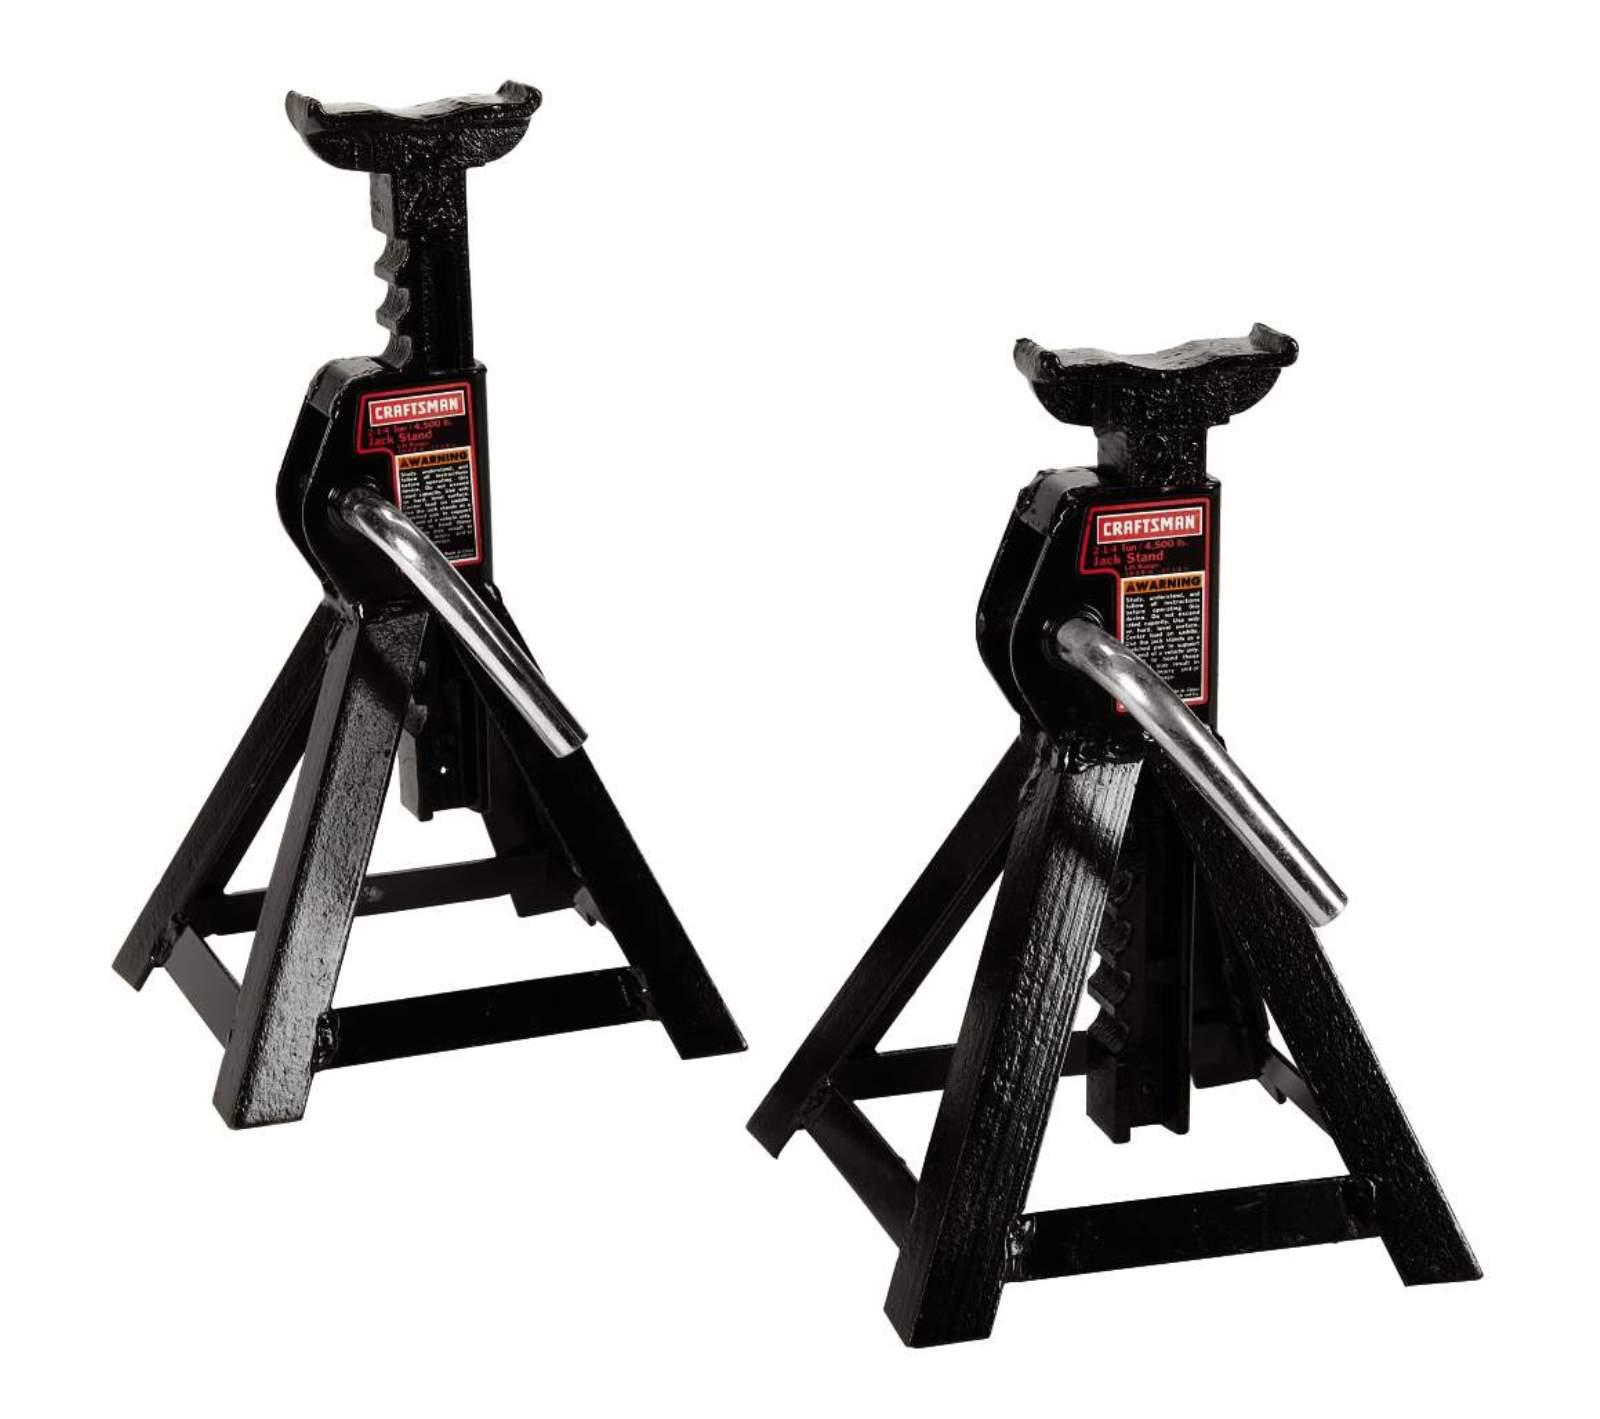 Craftsman 2-1/4 ton Jack Stands, 2 pk.